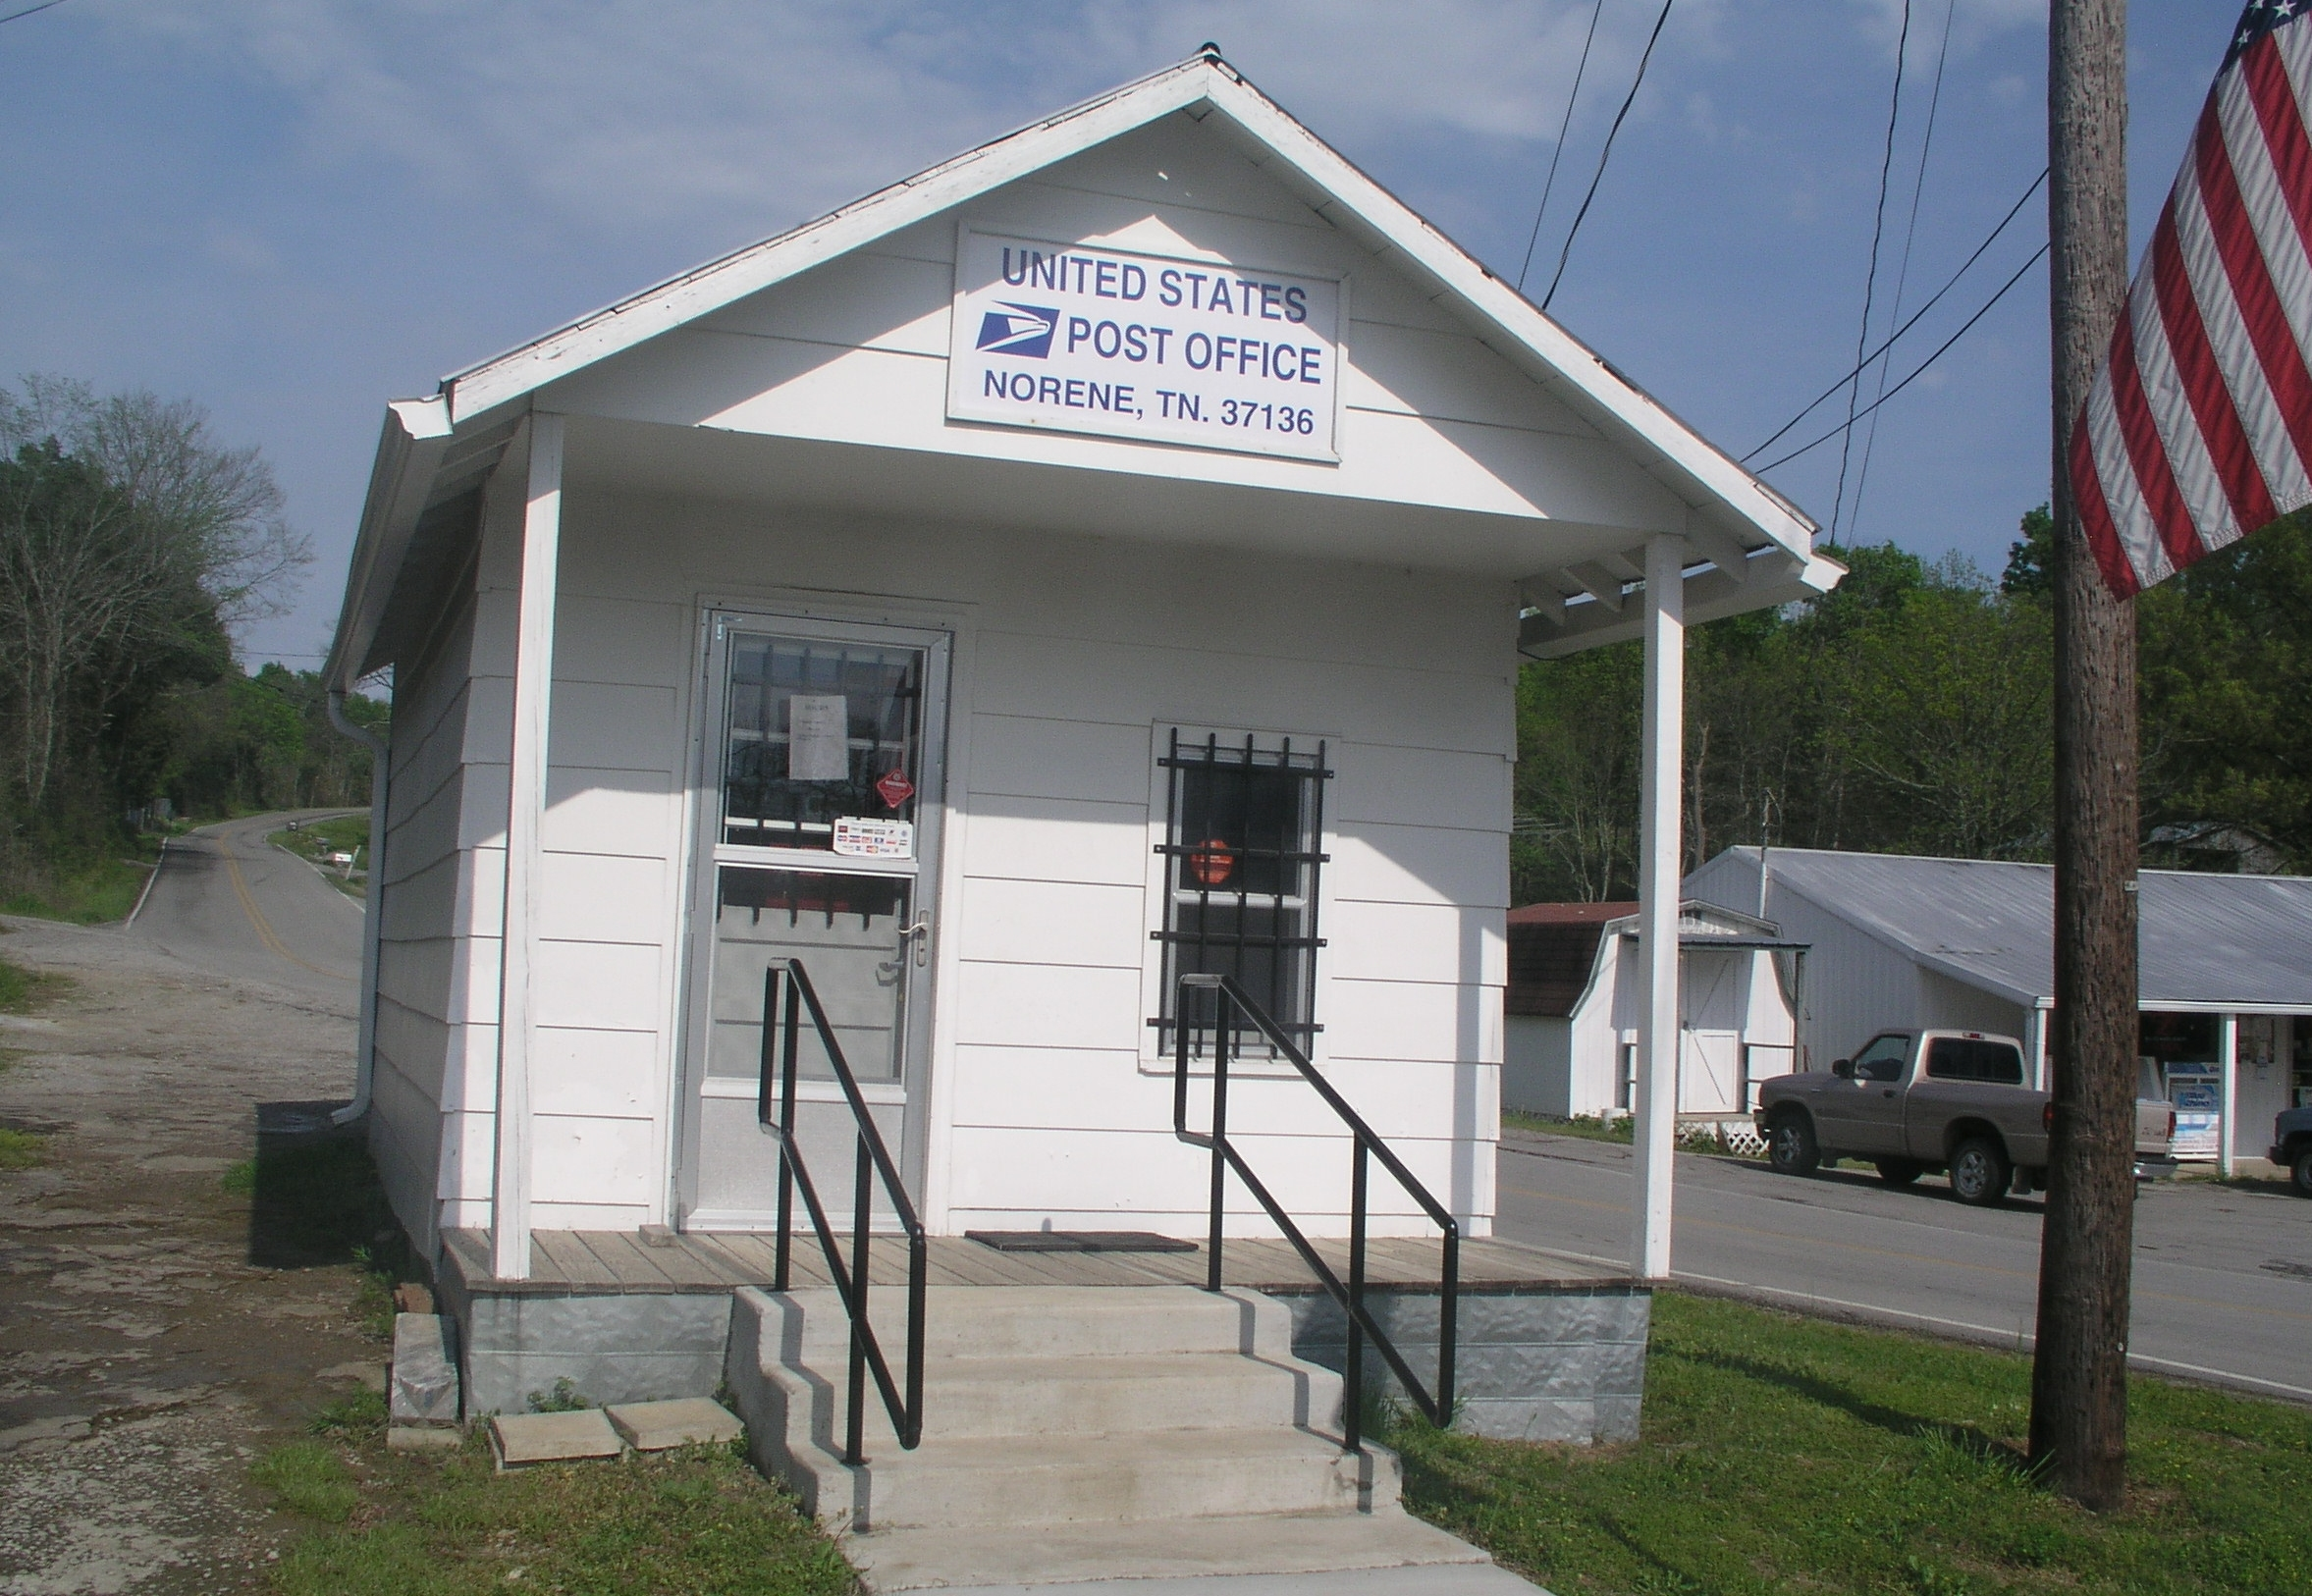 File:Norene tennessee post office.jpg - Wikipedia